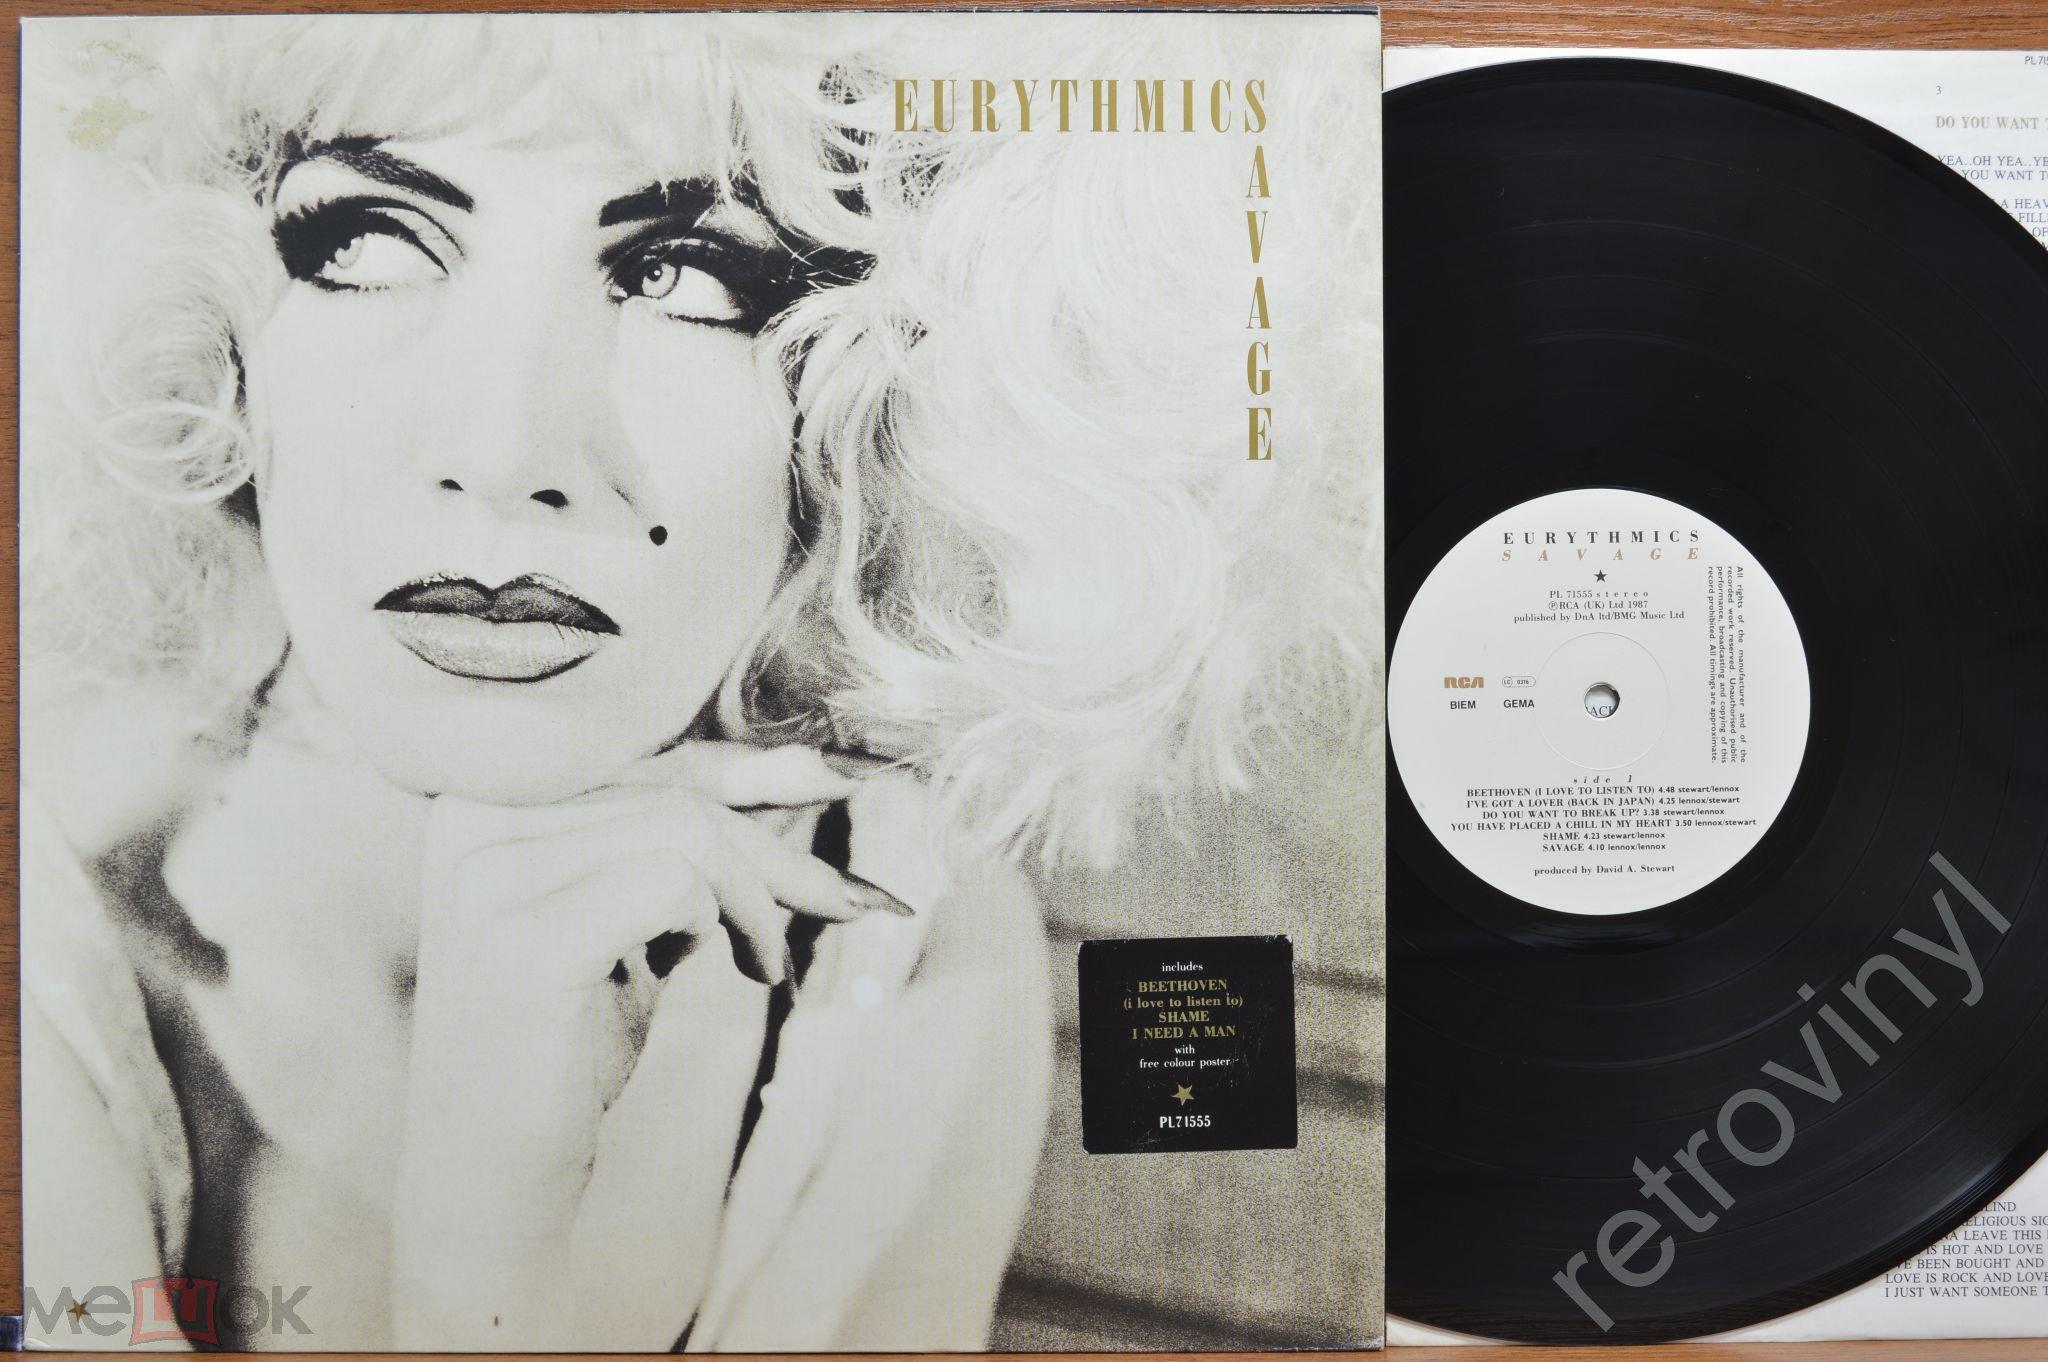 EURYTHMICS - Savage - PL 71555 RCA (UK) Ltd. =POSTER= ORIGINAL 1987 года GERMANY пресс MINT